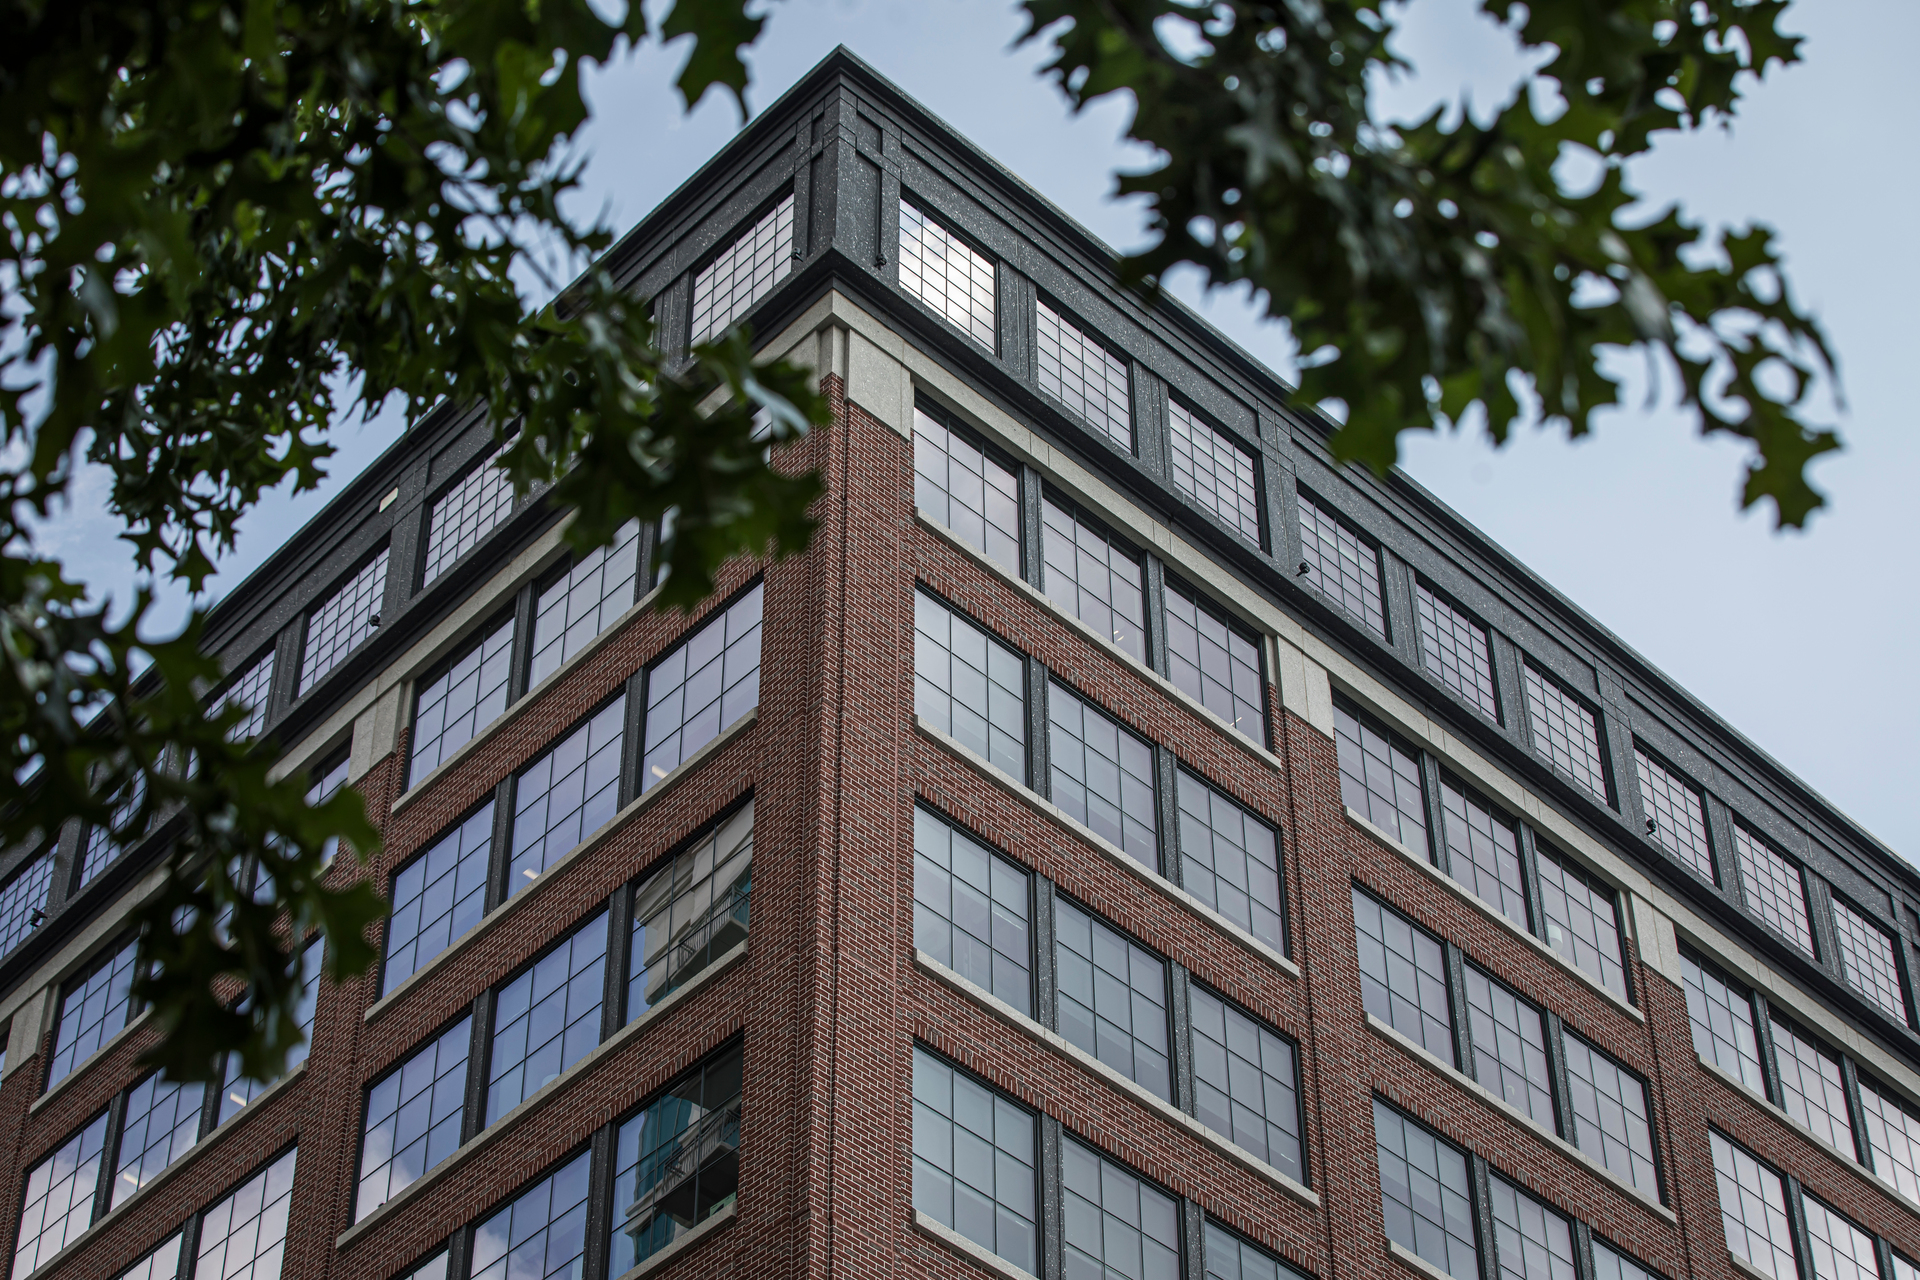 Pella Windows and Doors 309 East Paces Atlanta Georgia Fixed Frame Building Windows Brick Face Facade